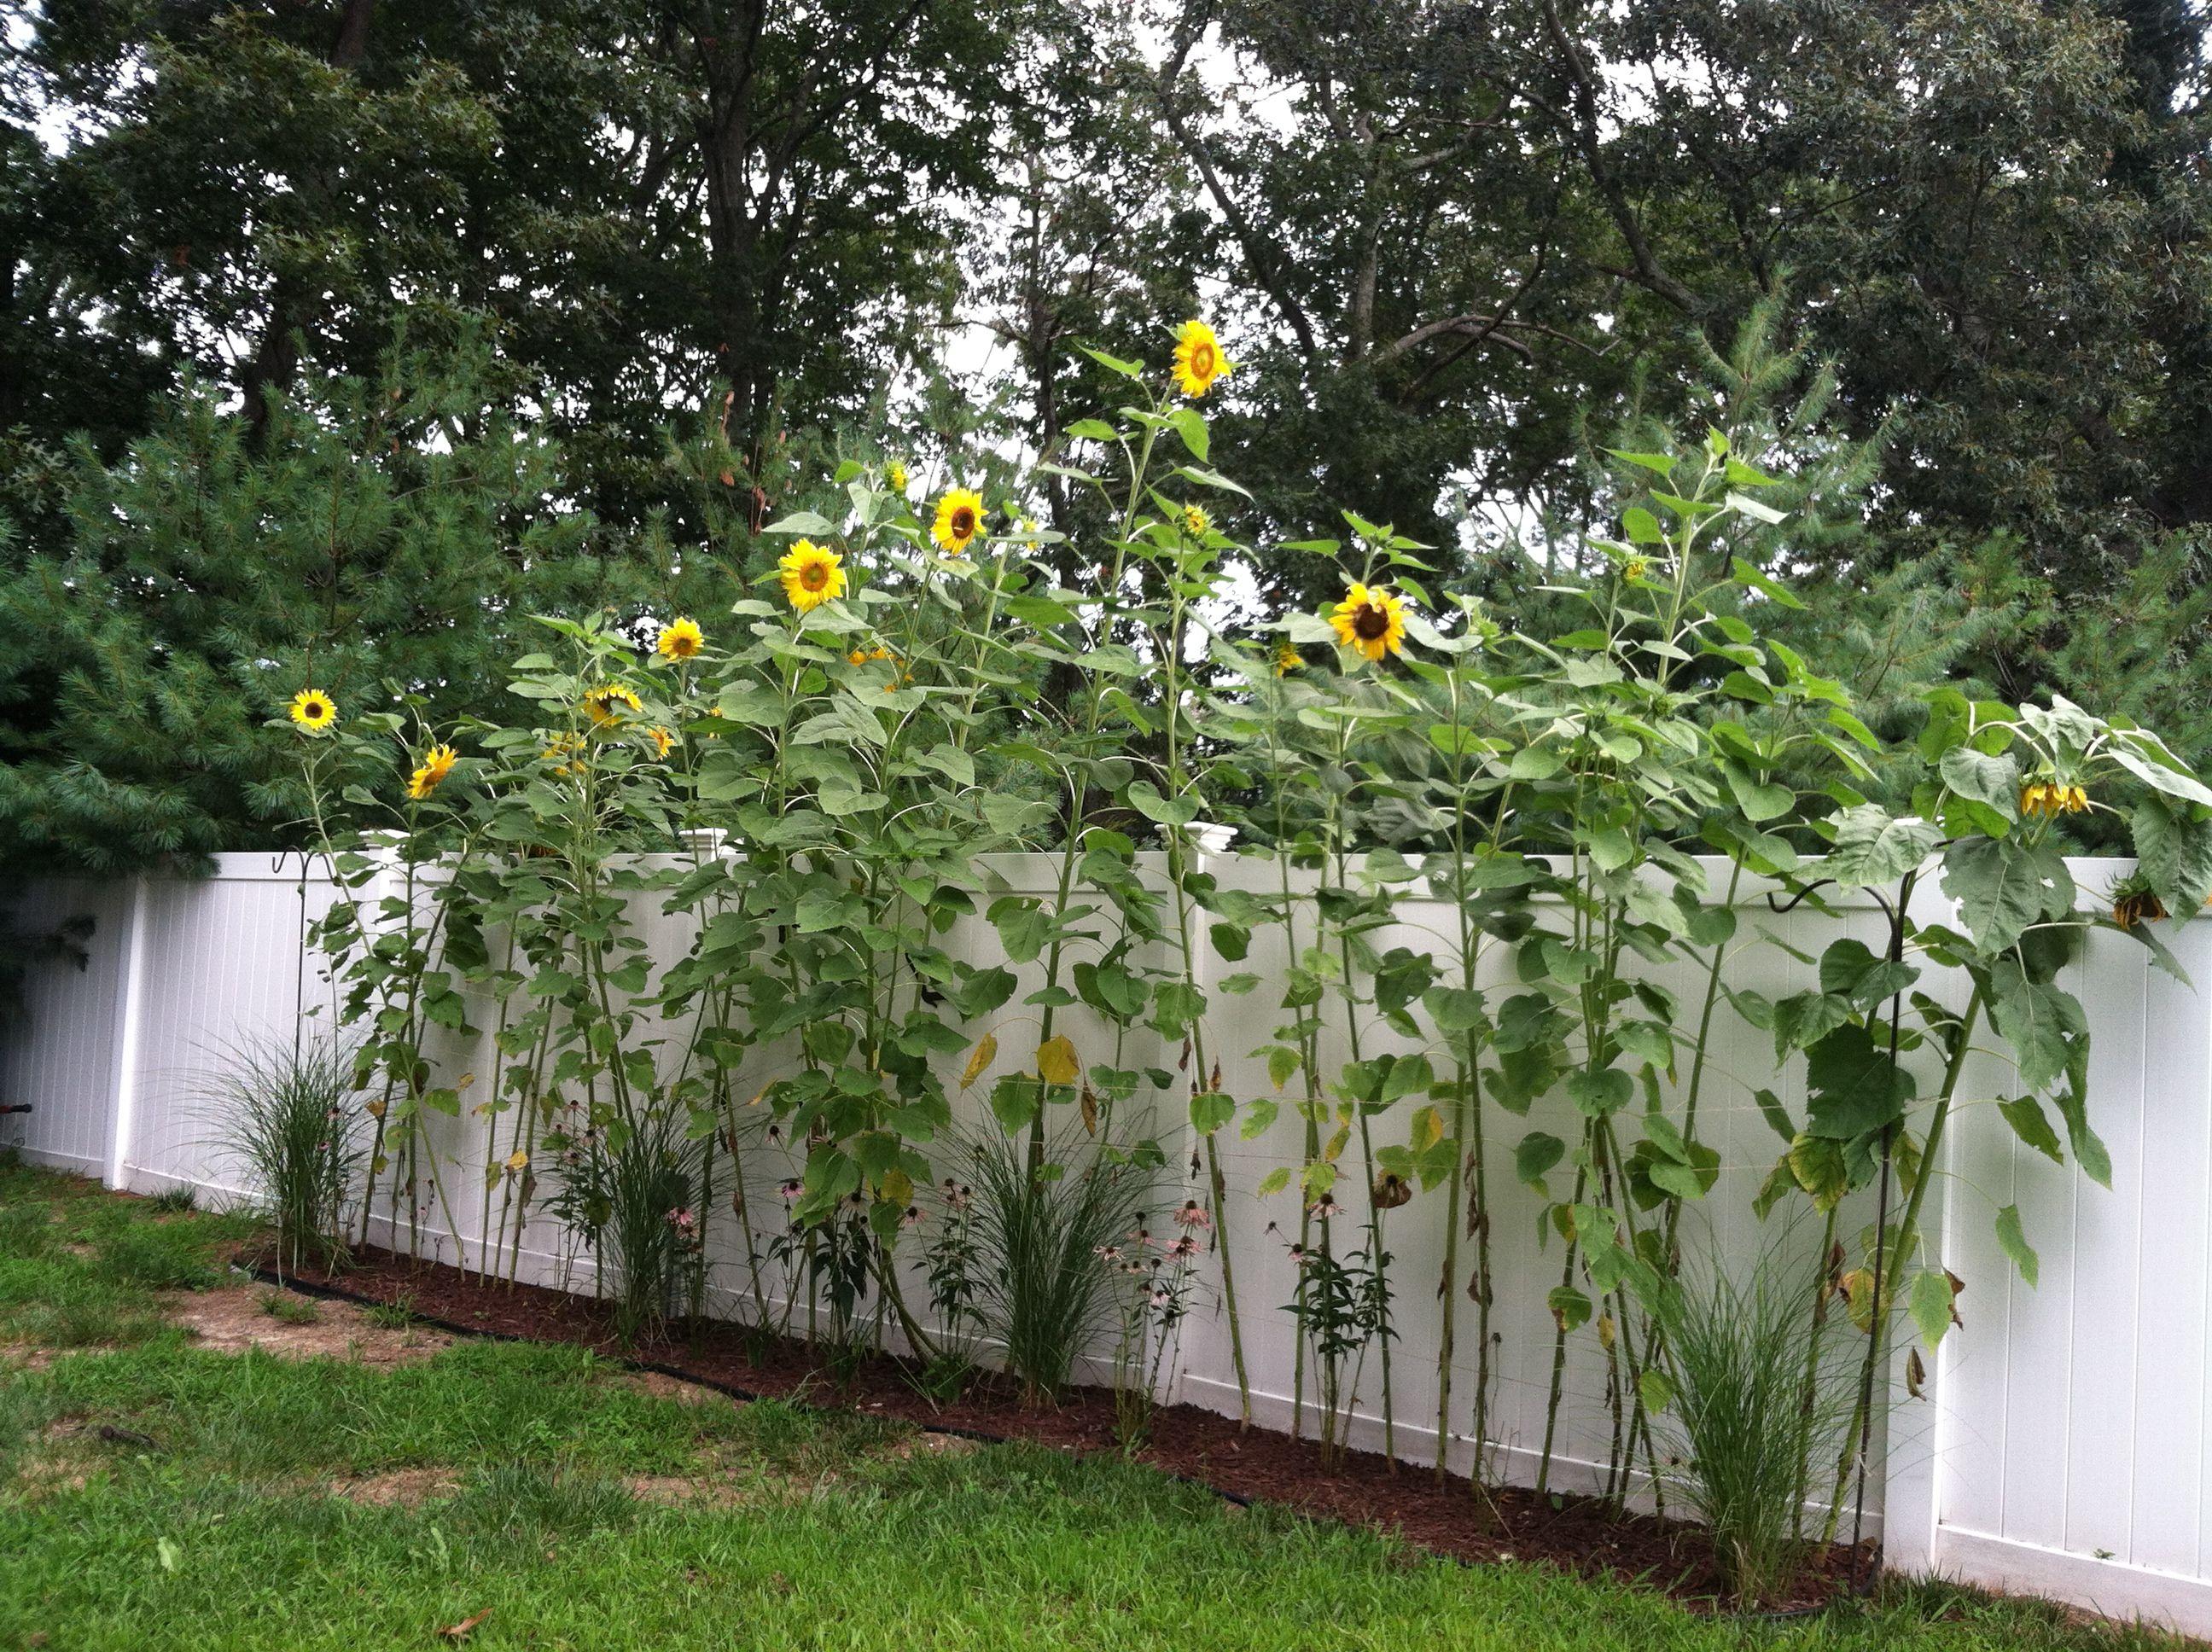 Sunflower Garden Ideas sunflower plants garden plants ideas sunflower pictures Garden Ideas